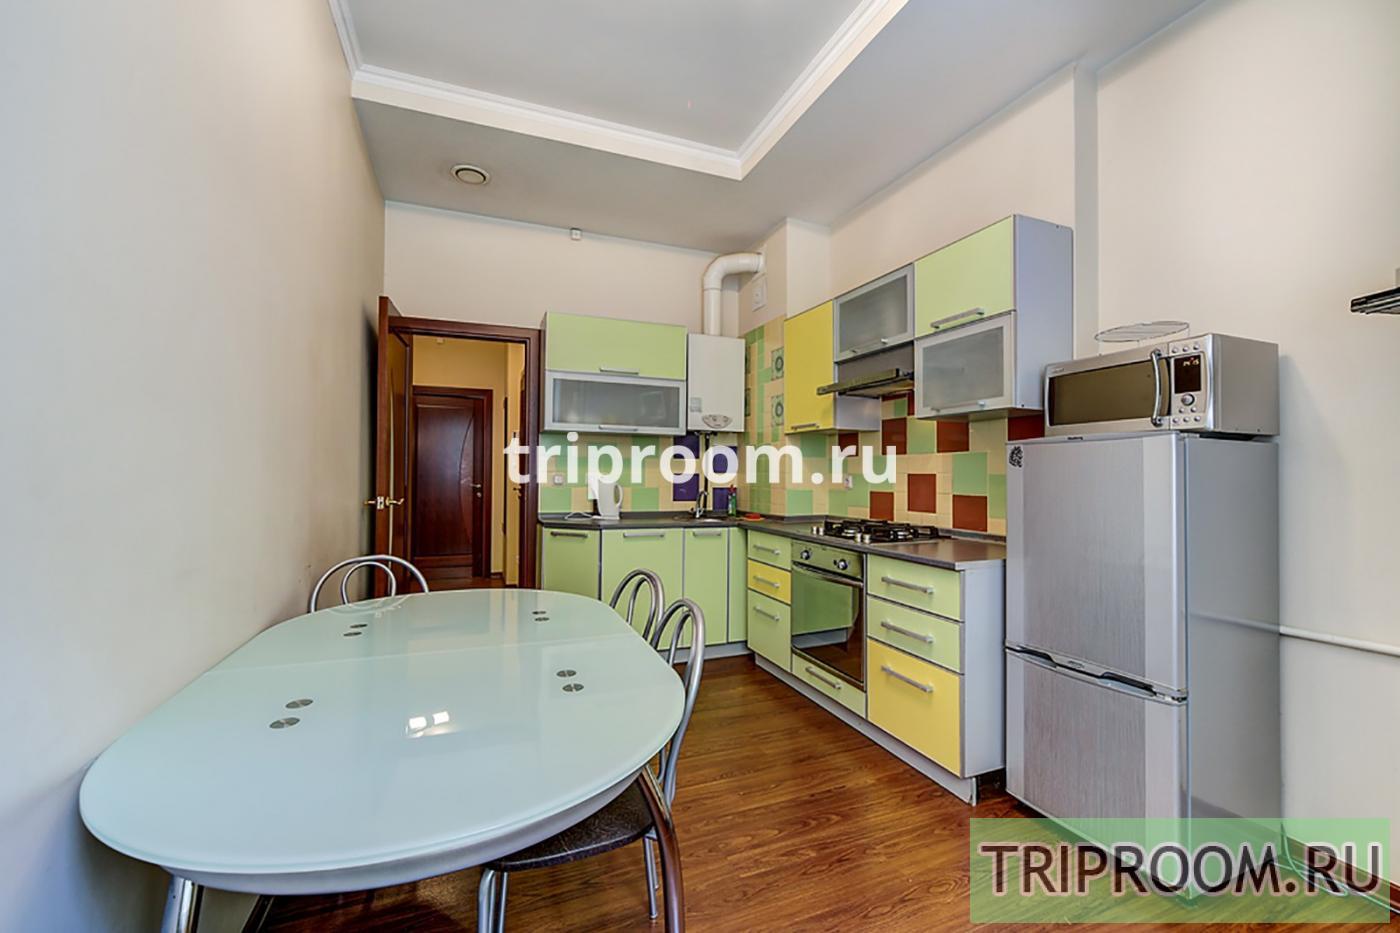 1-комнатная квартира посуточно (вариант № 15527), ул. Канала Грибоедова набережная, фото № 4